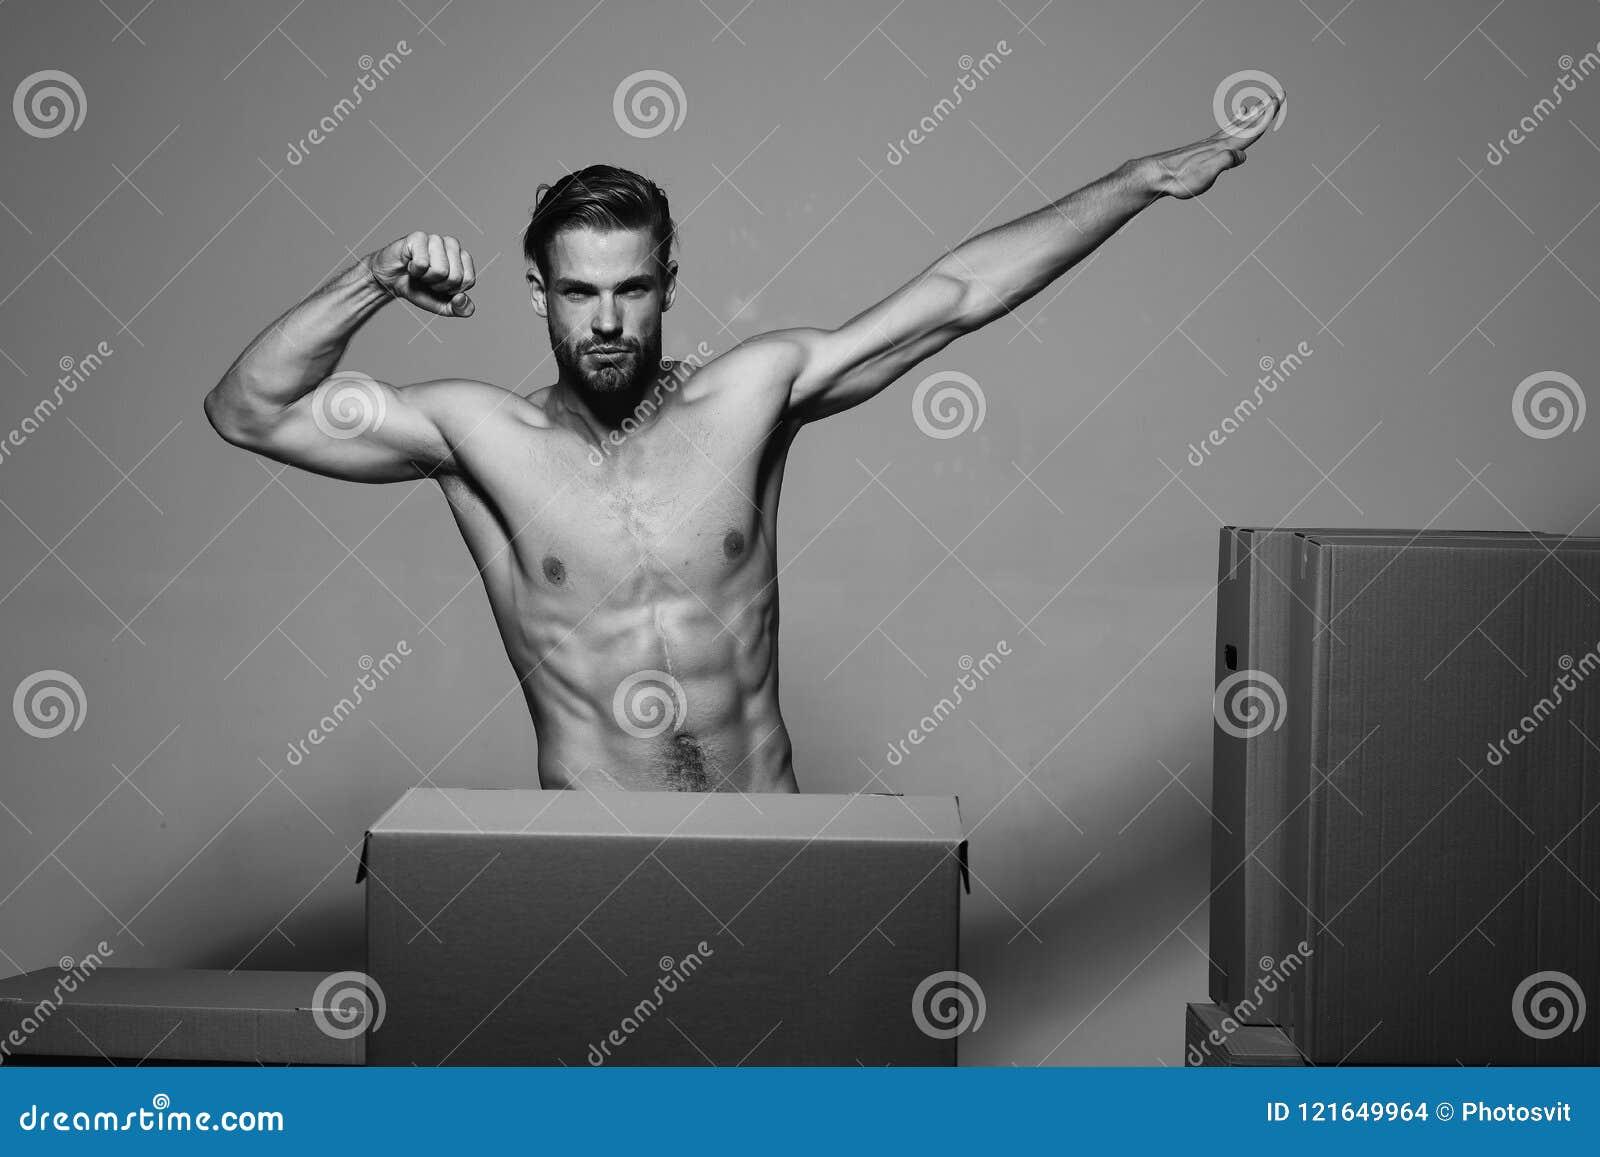 Automon man naked images 162